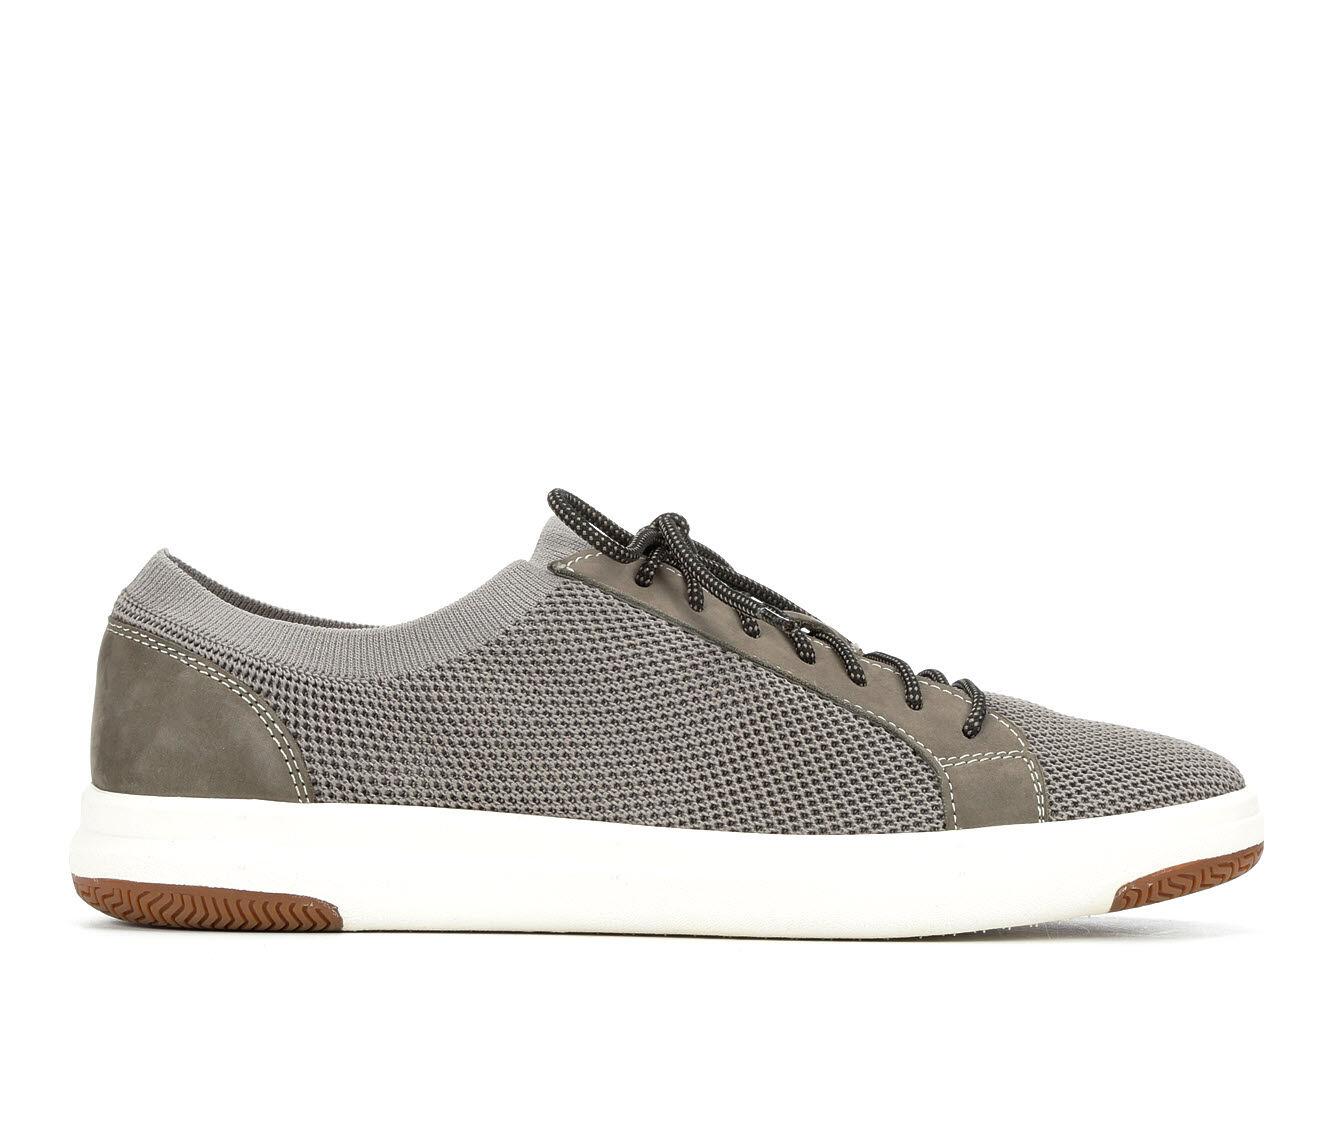 Men's Dockers Franklin Casual Shoes Grey